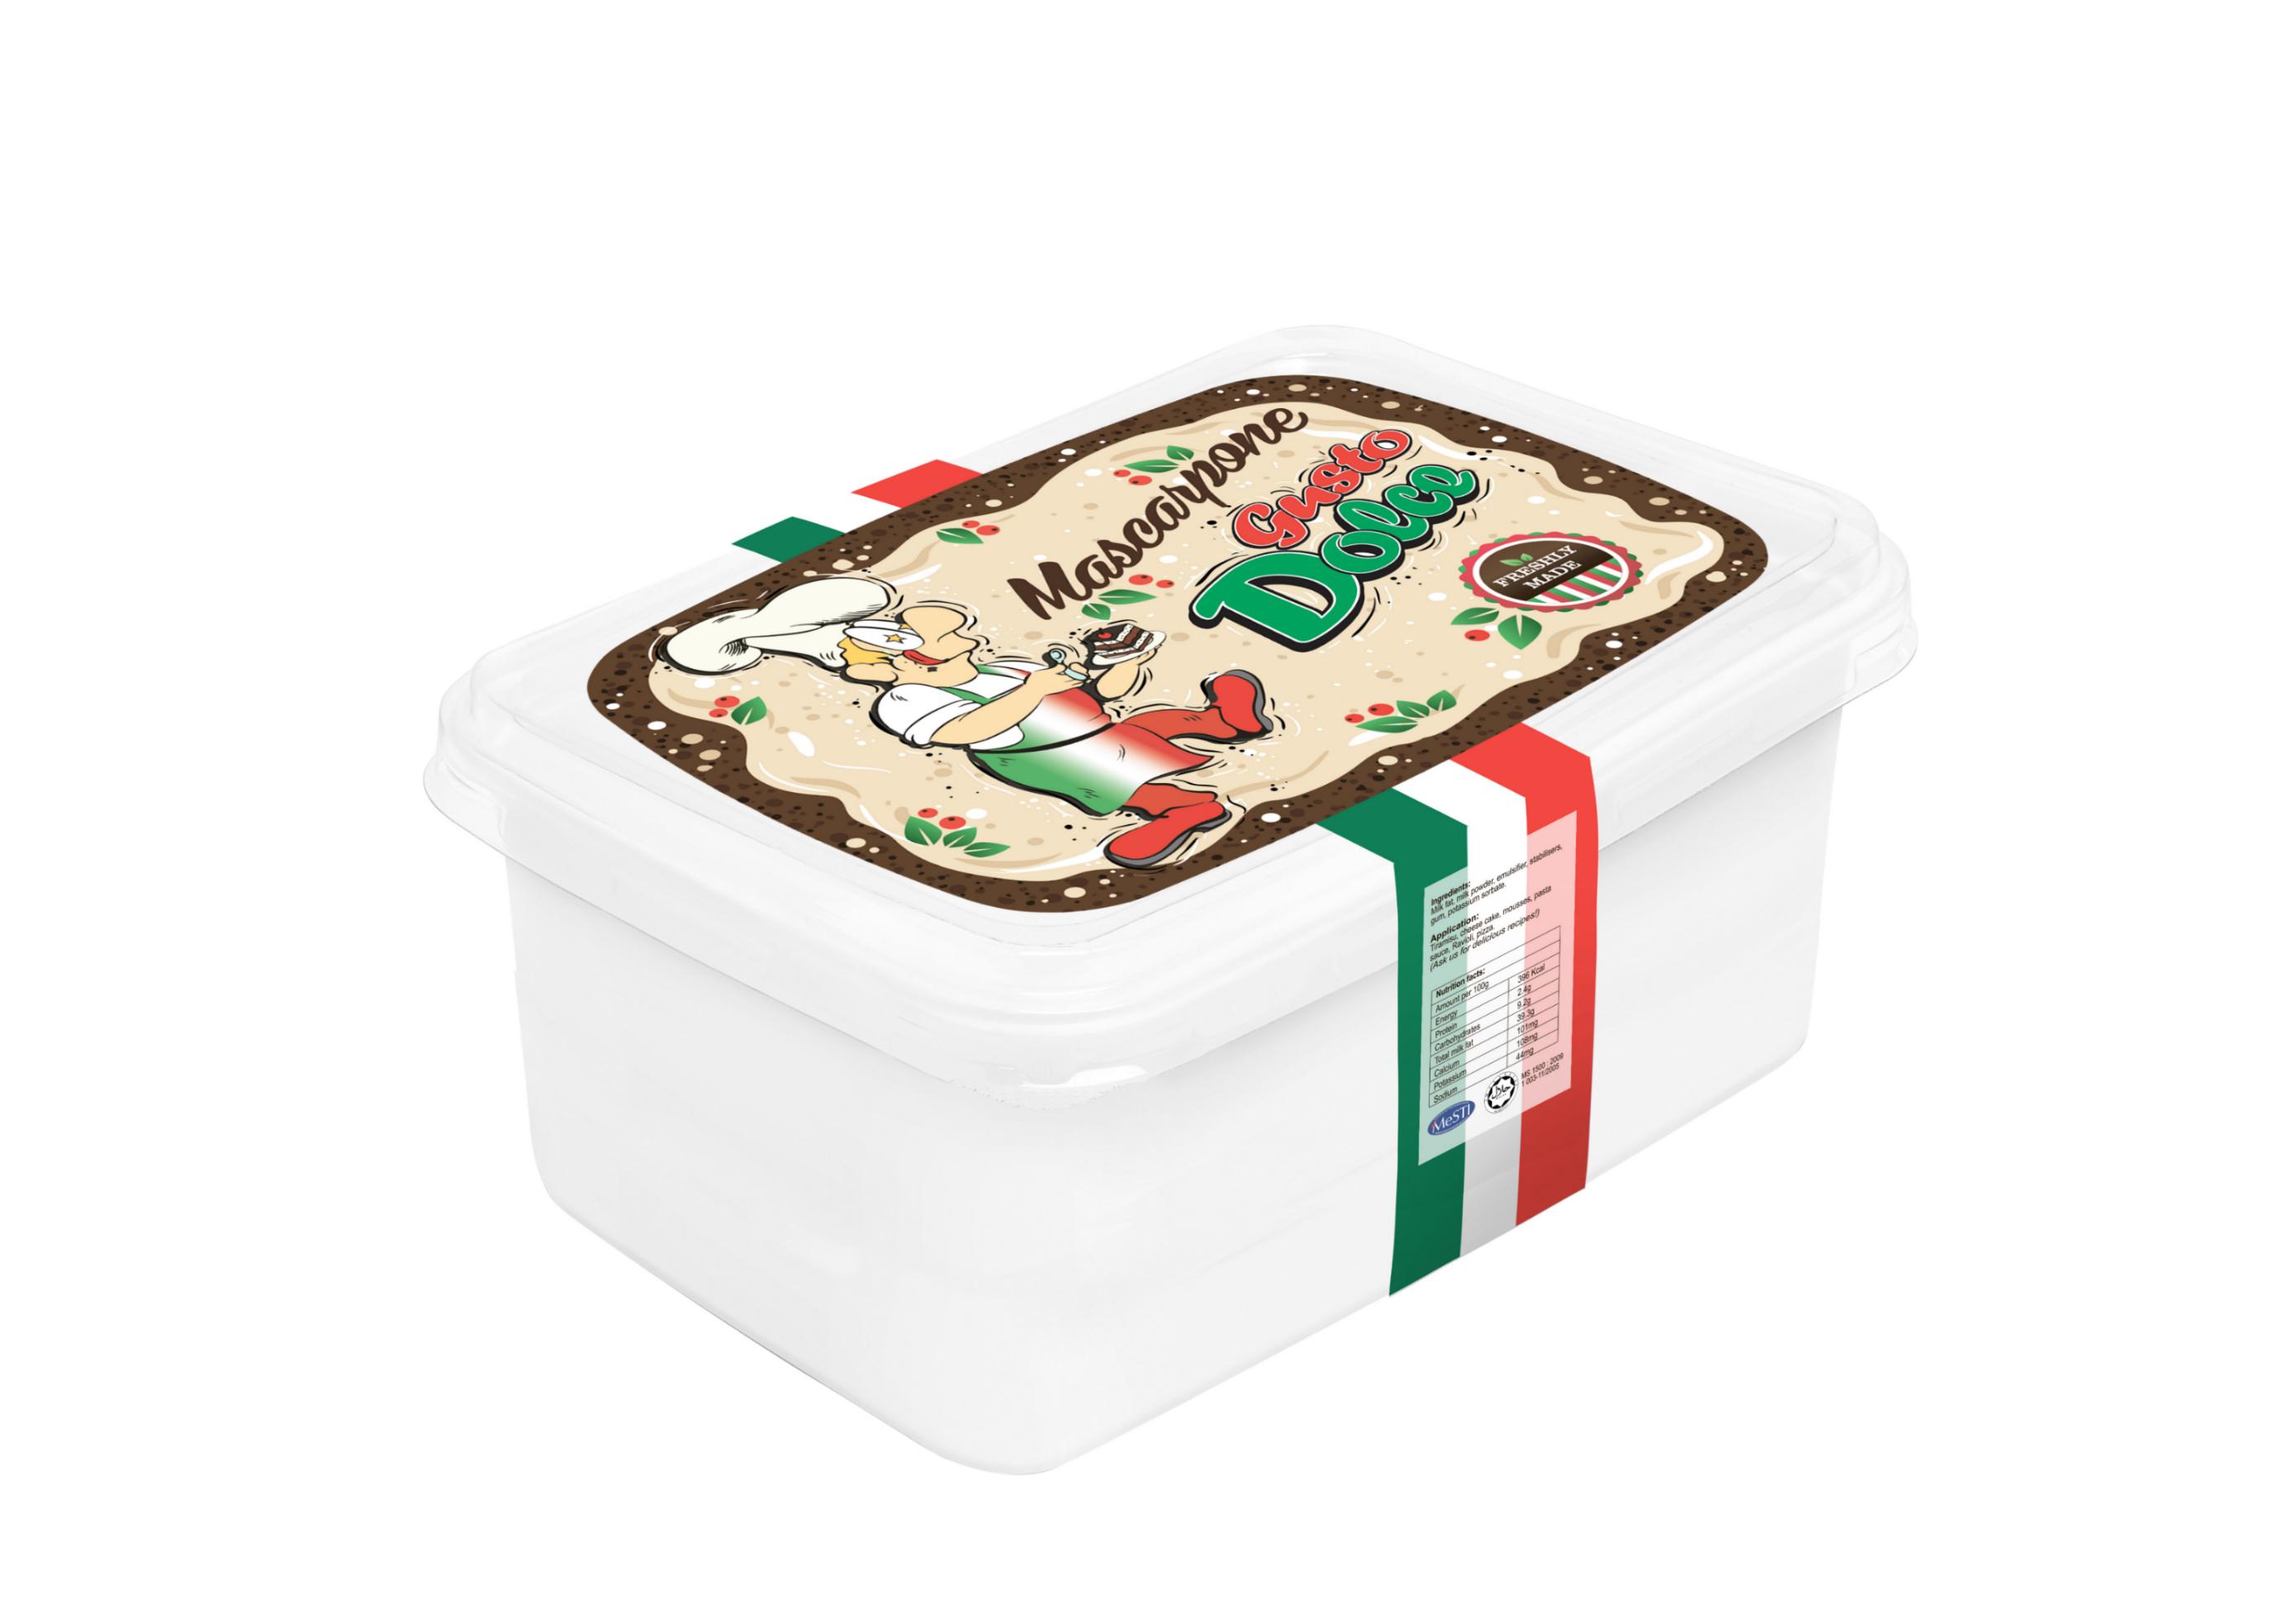 Gusto dolce mascarpone tub mascarpone cheese 500ml